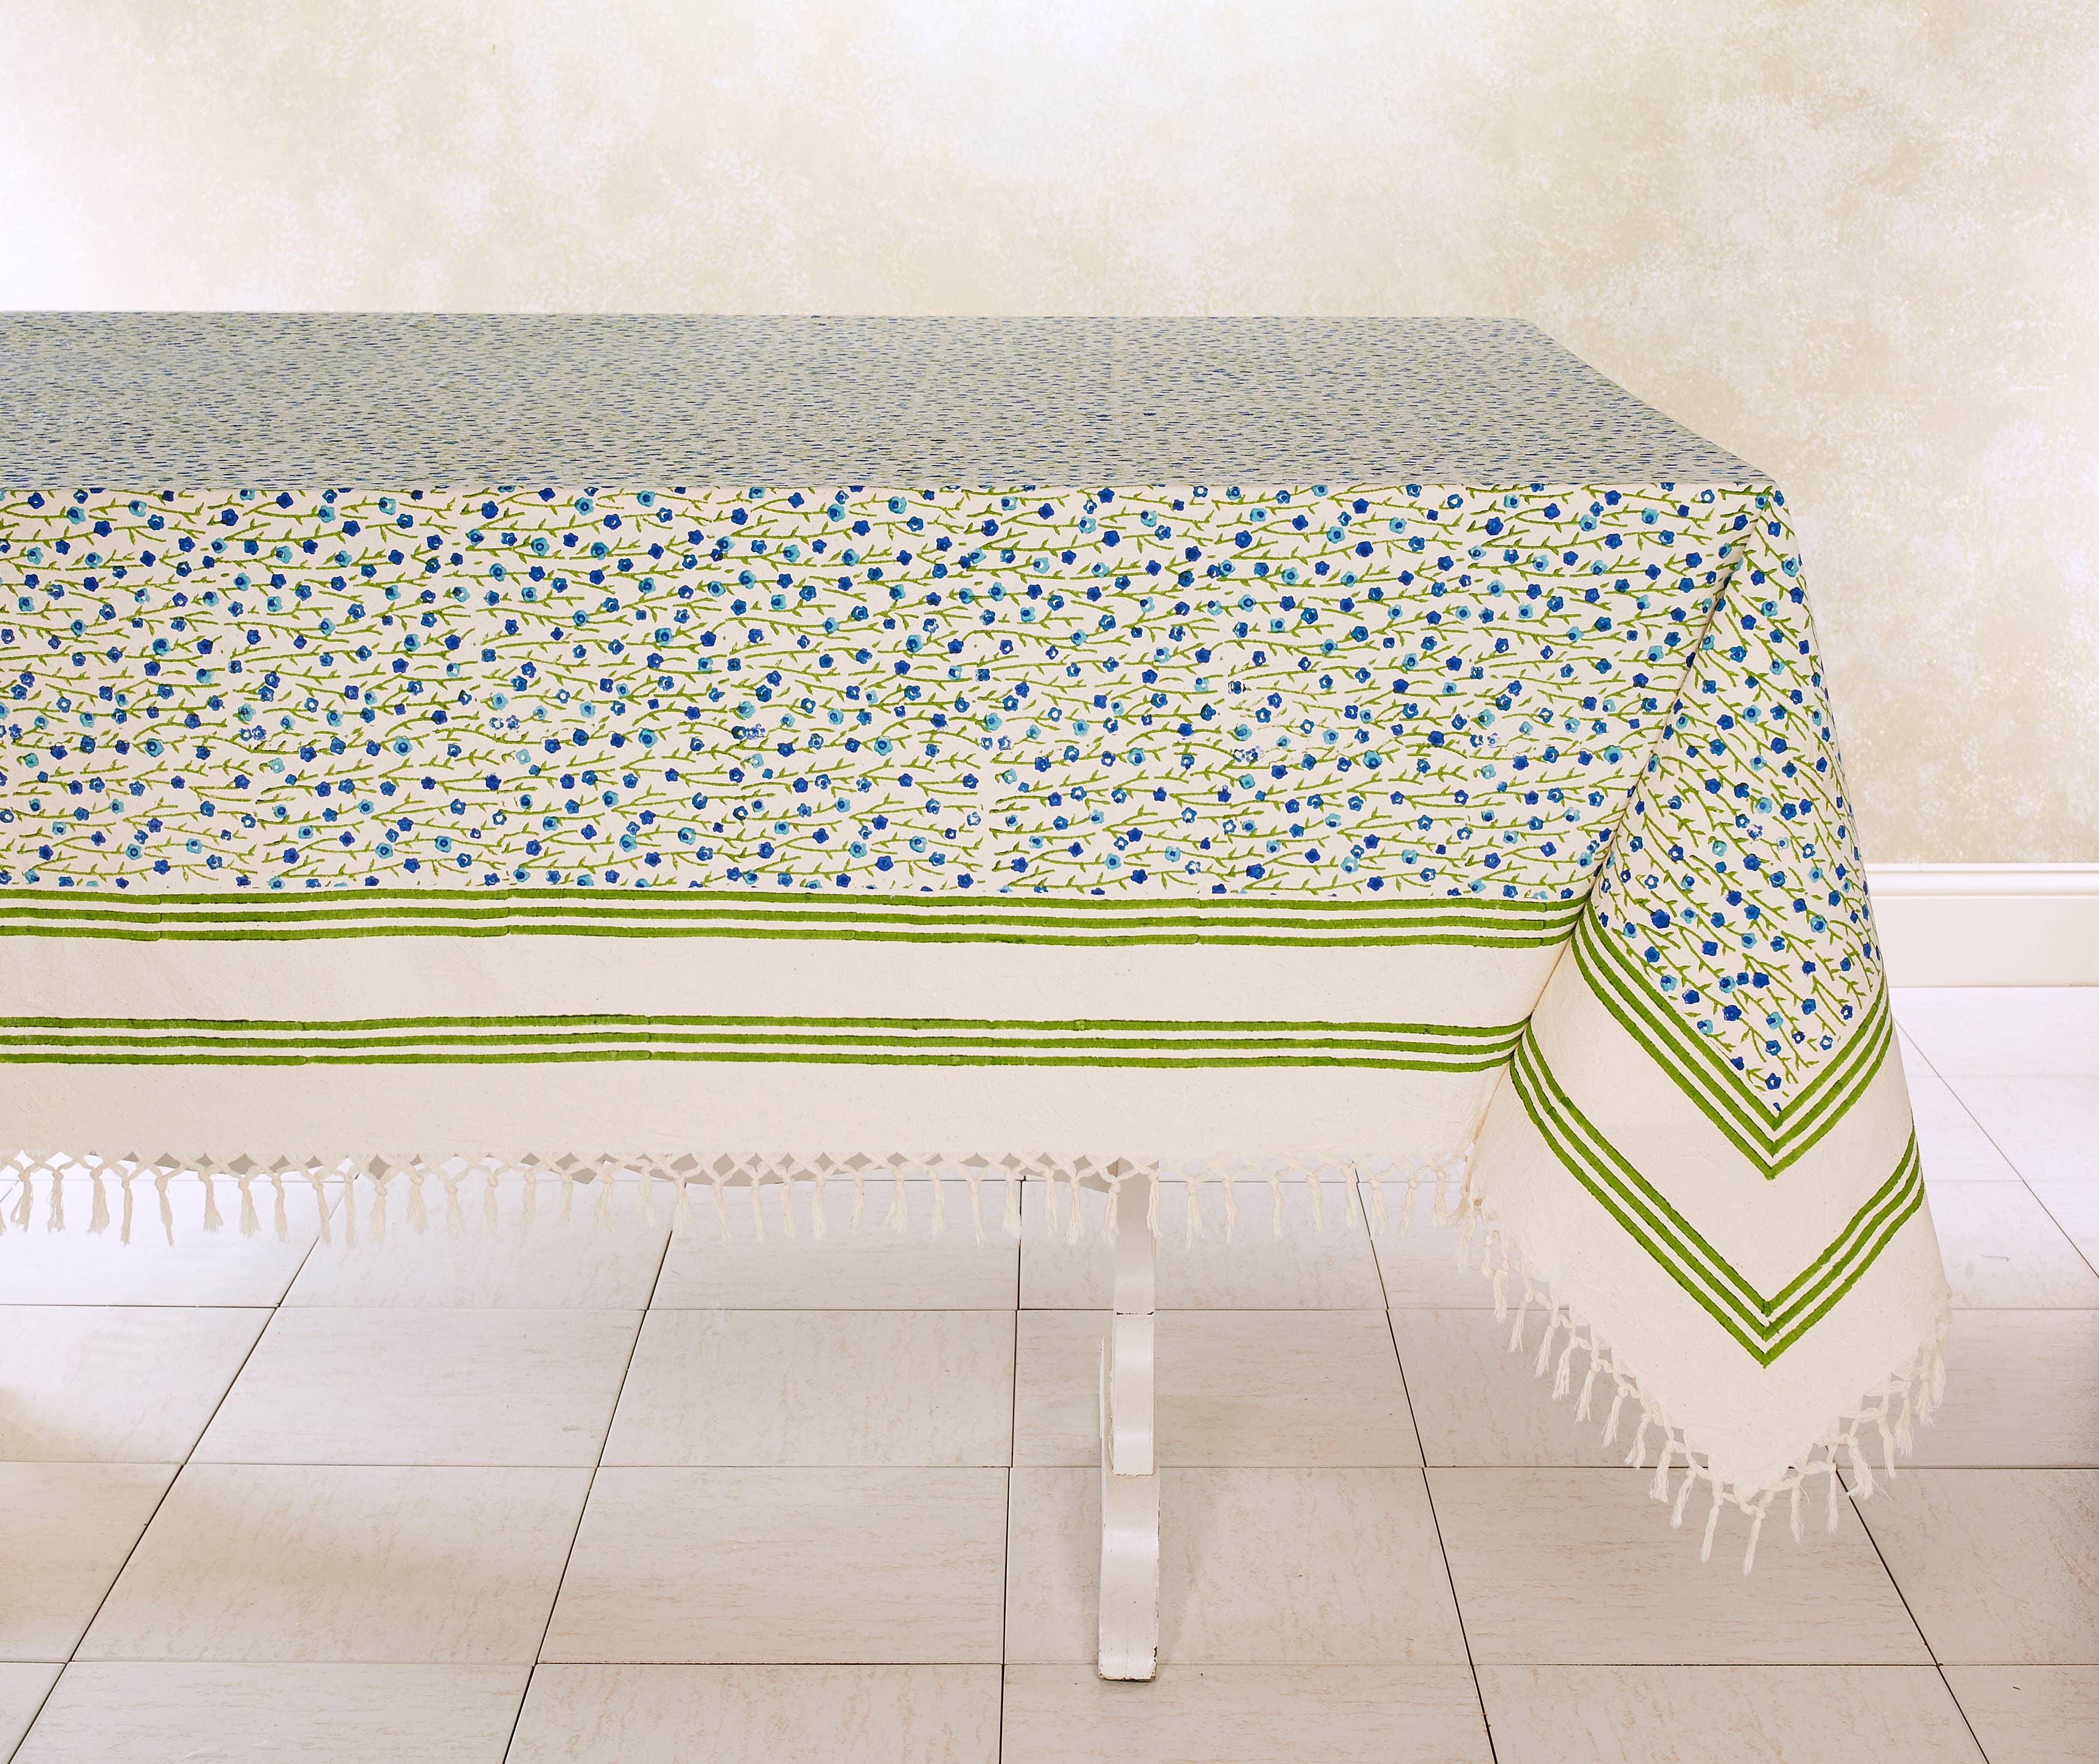 FIESTA BLUE Tablecloth Hand Block Printed Cotton | Trada Marketplace